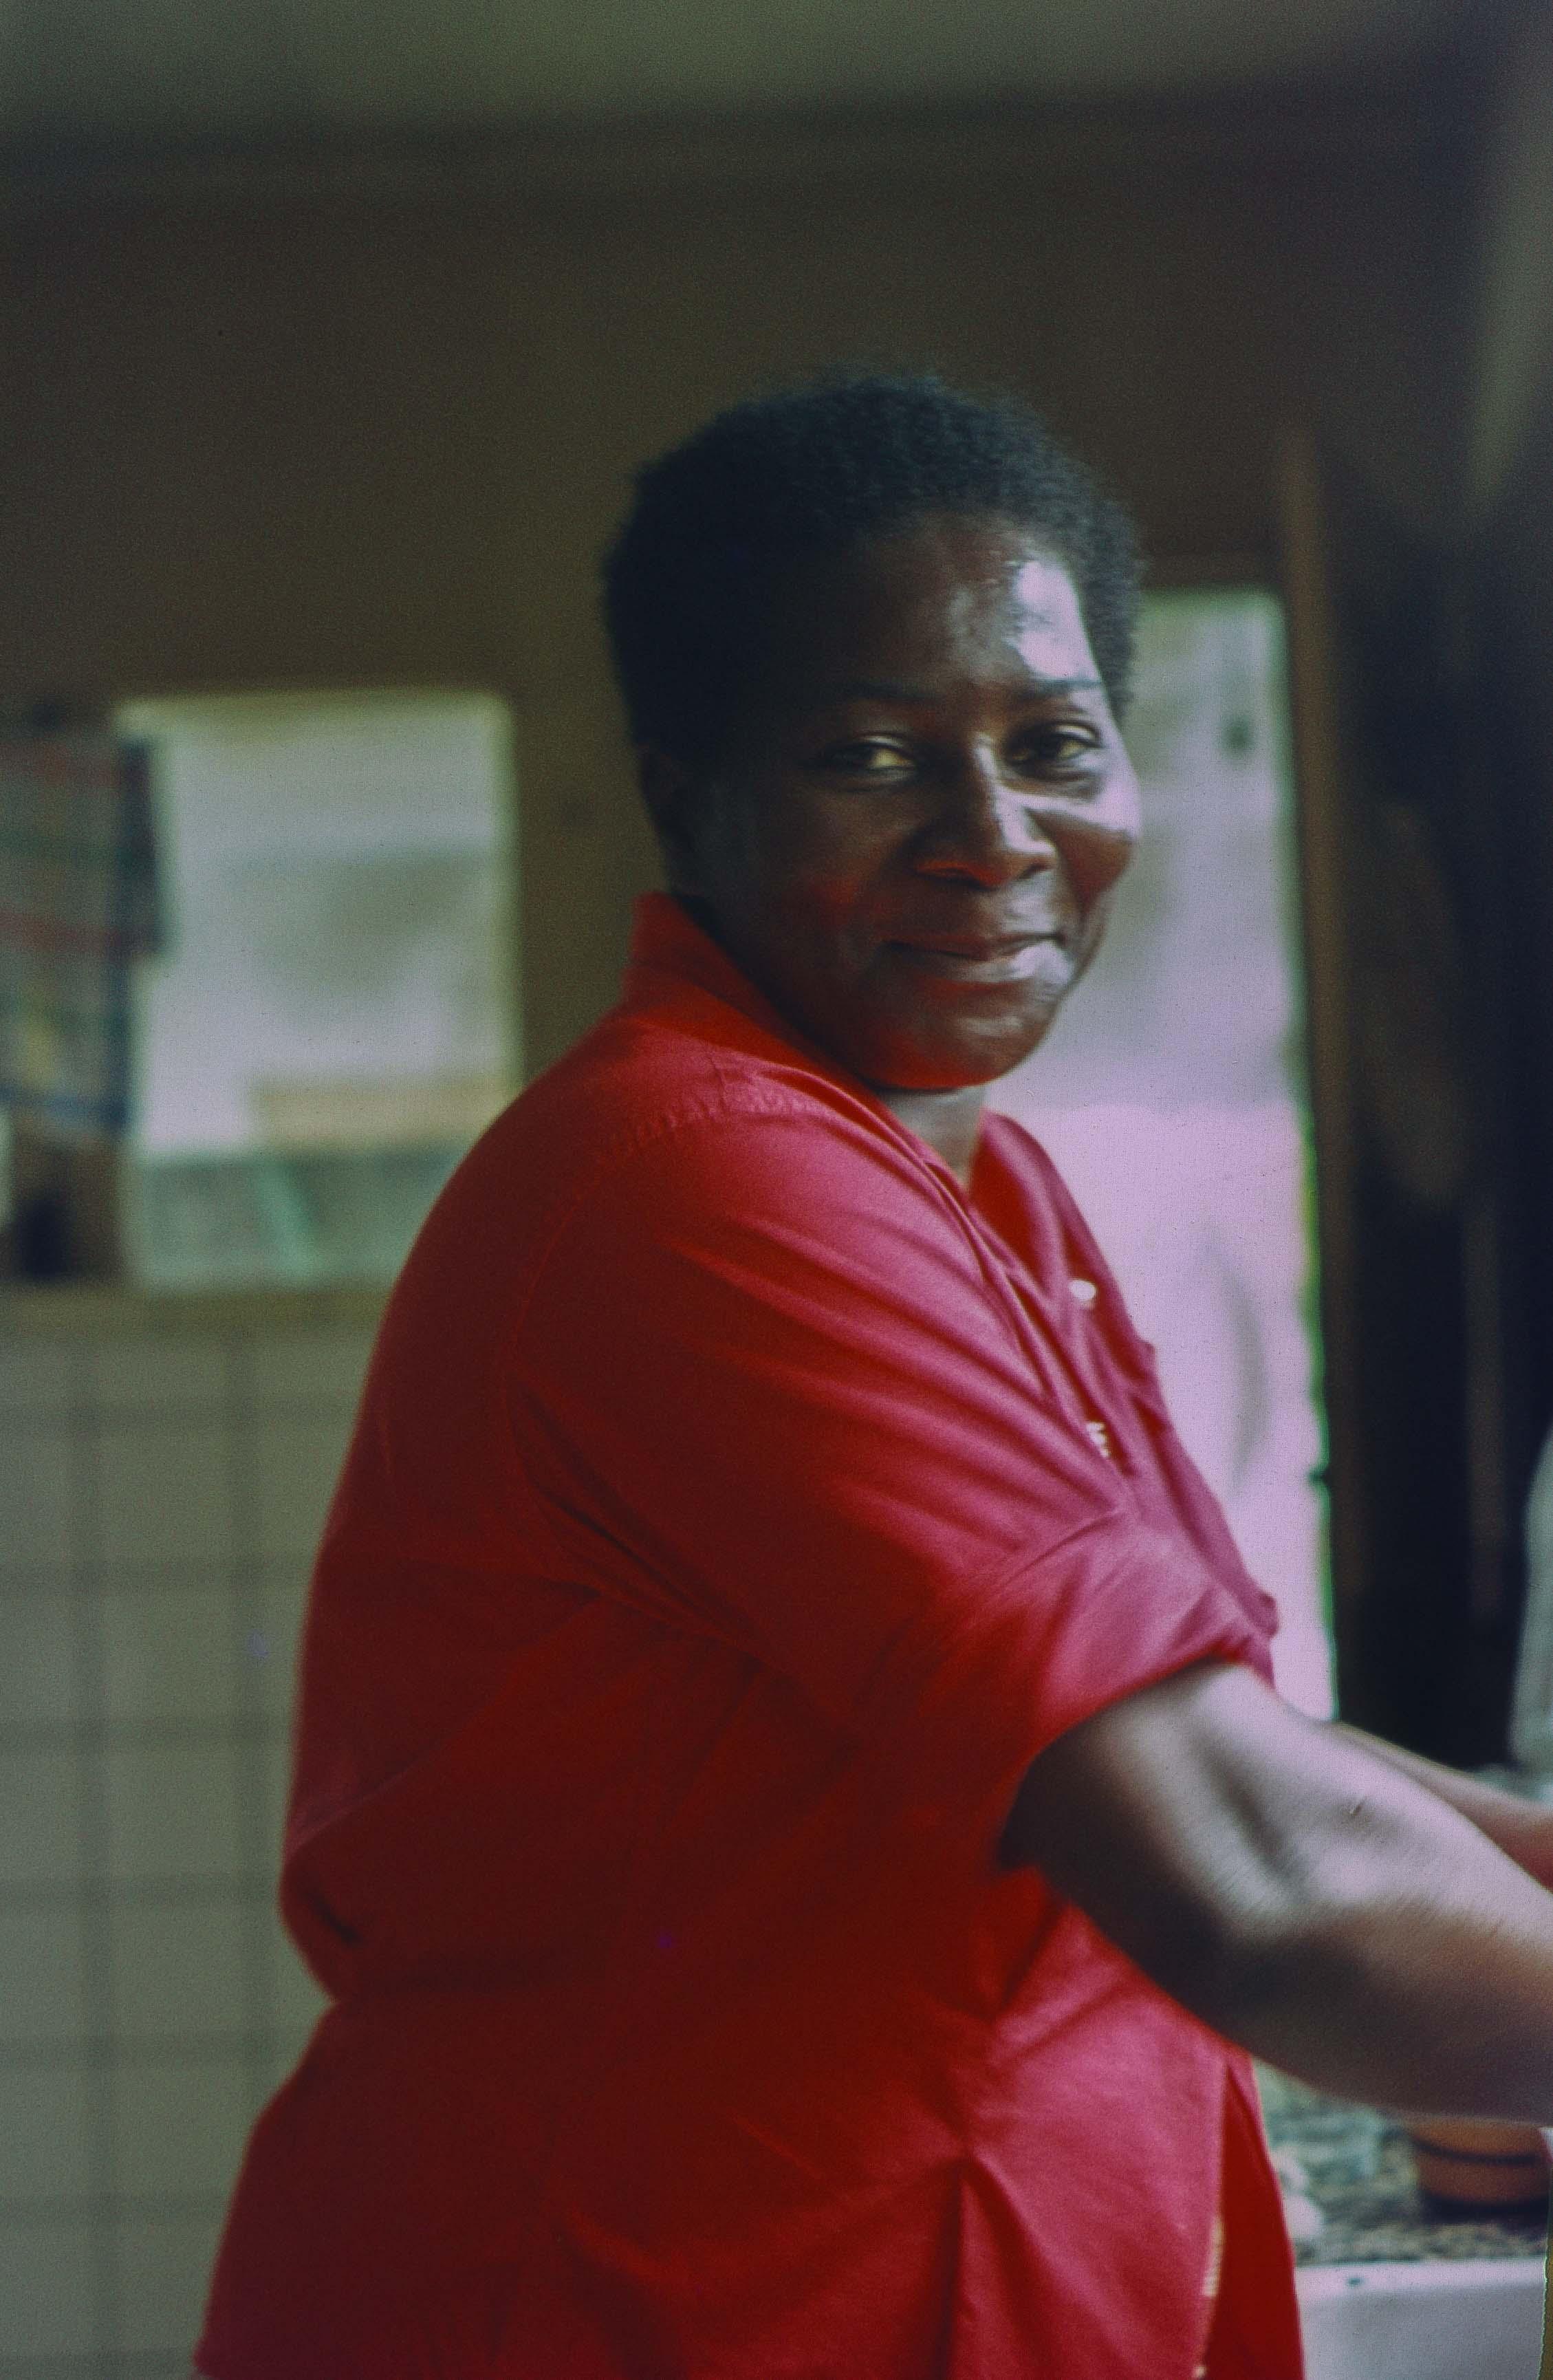 203. Suriname